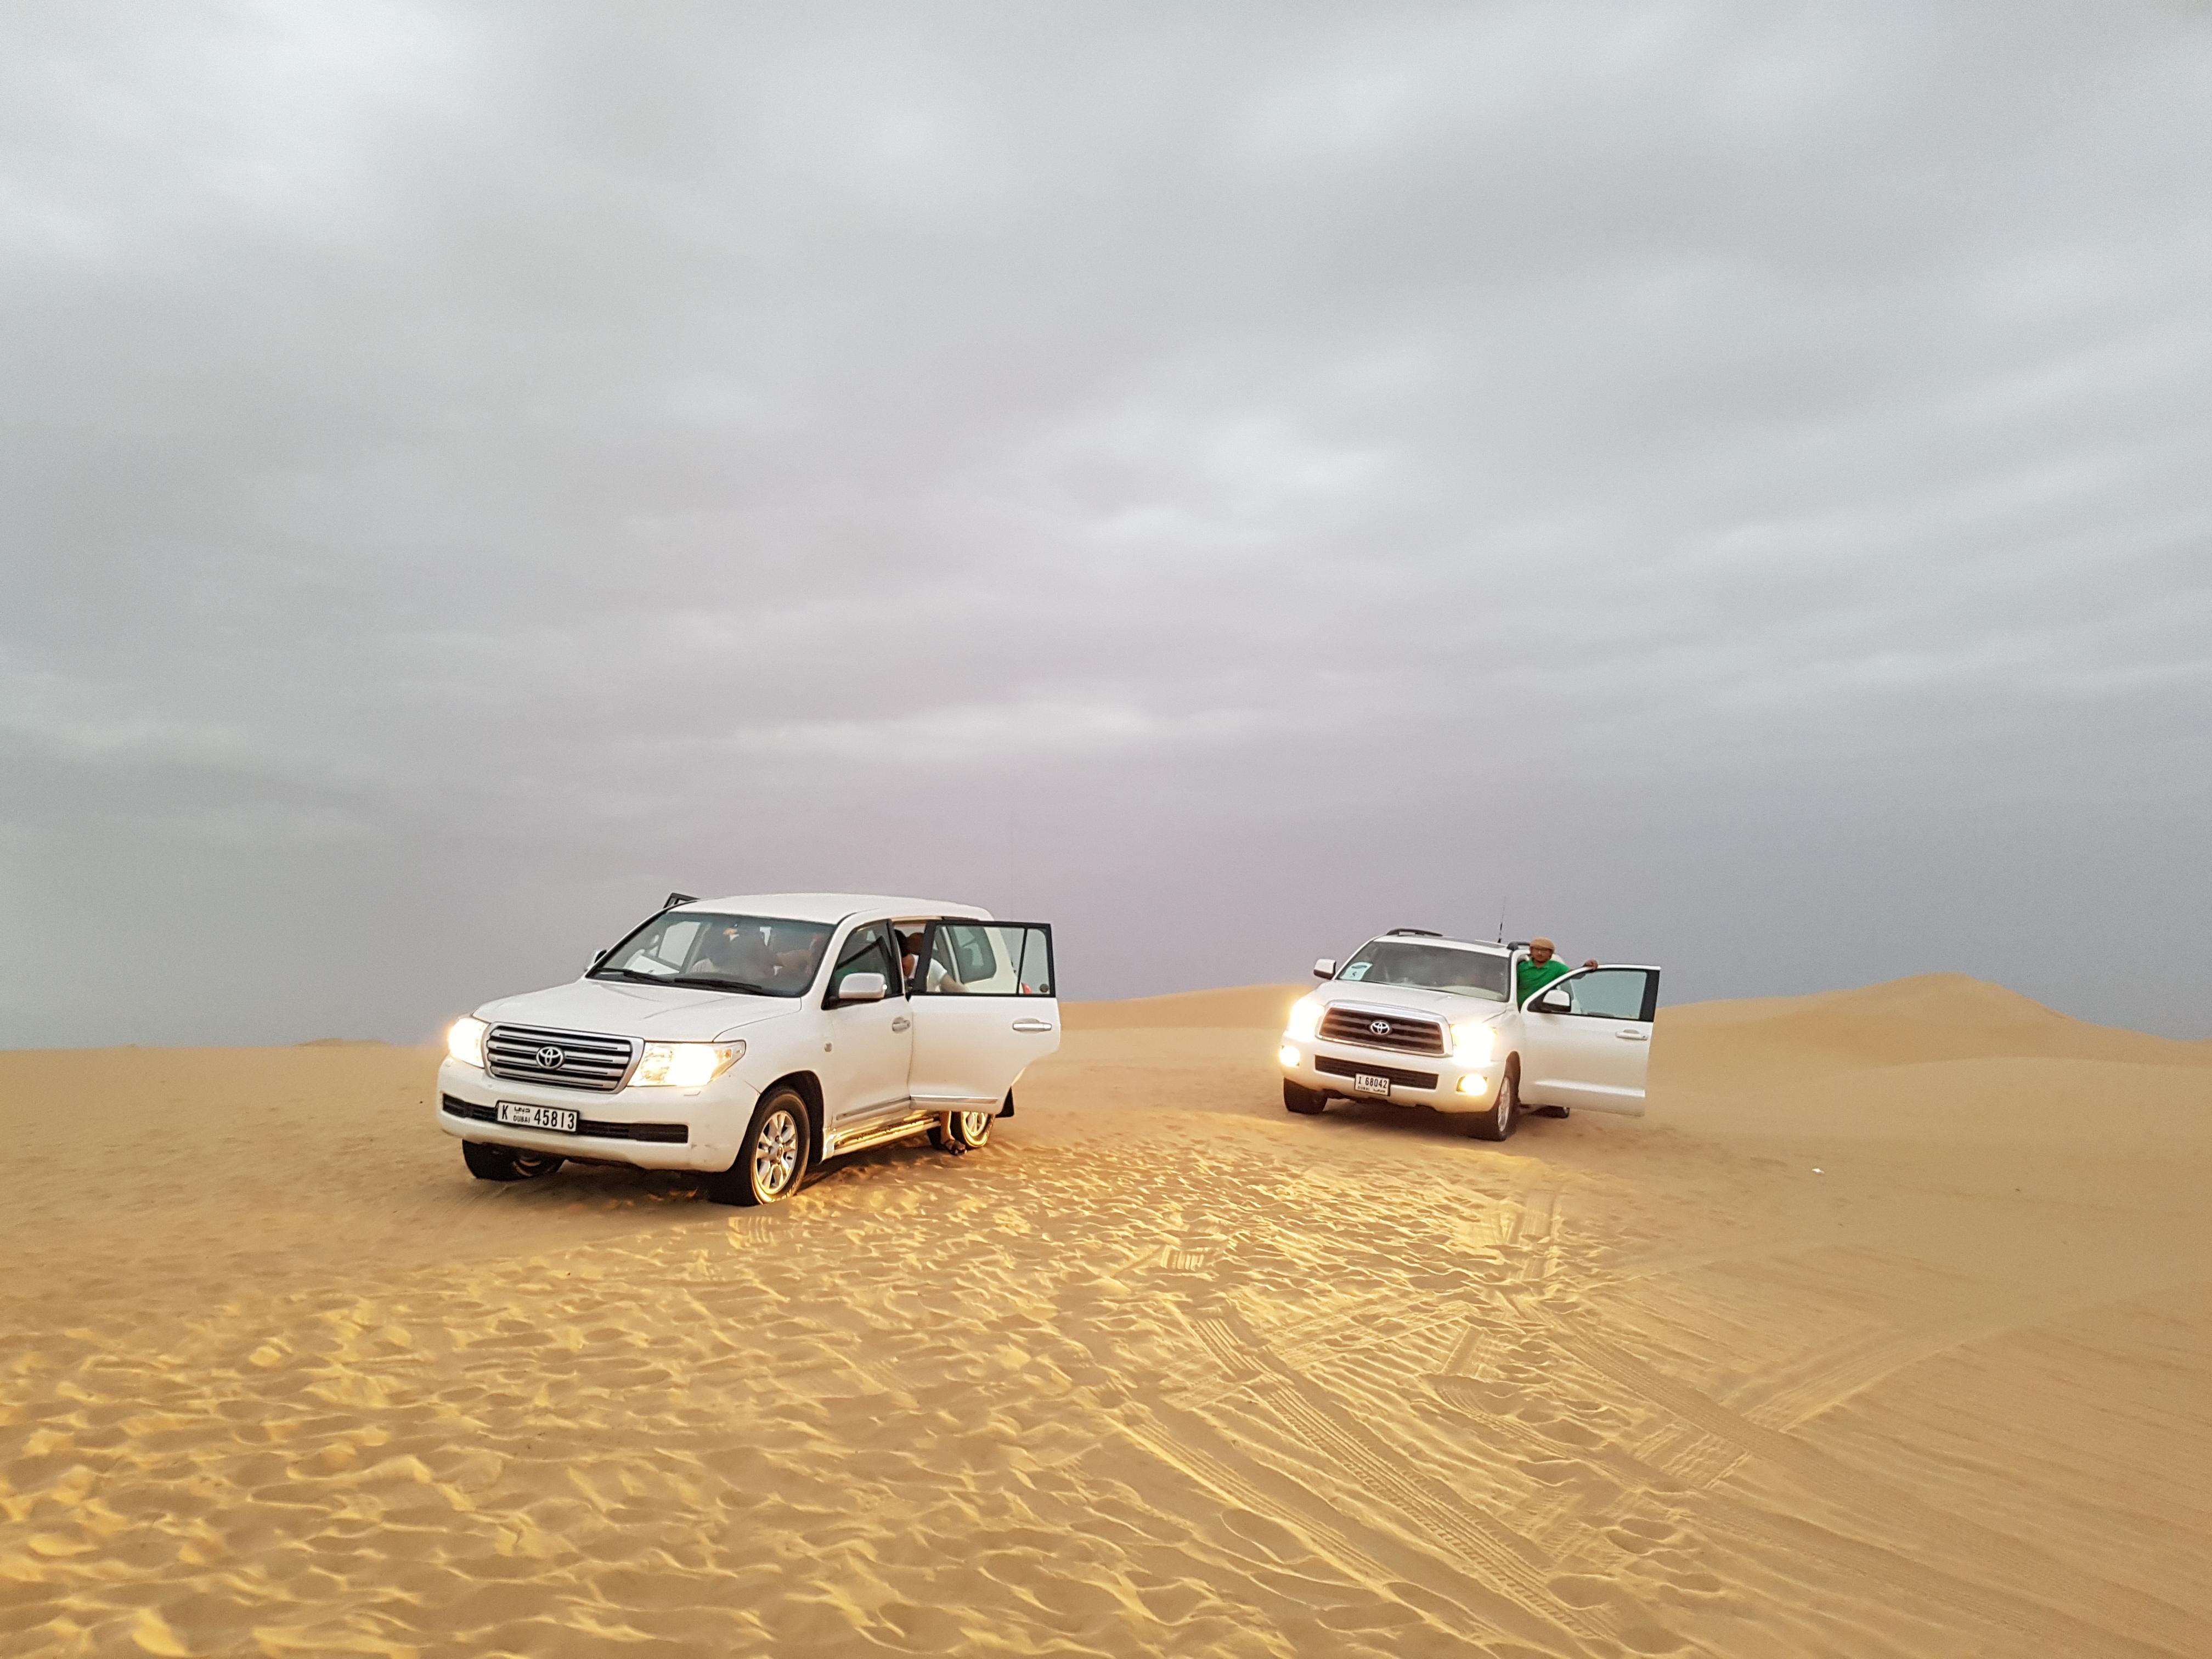 Dubai, Diamond of middle east!